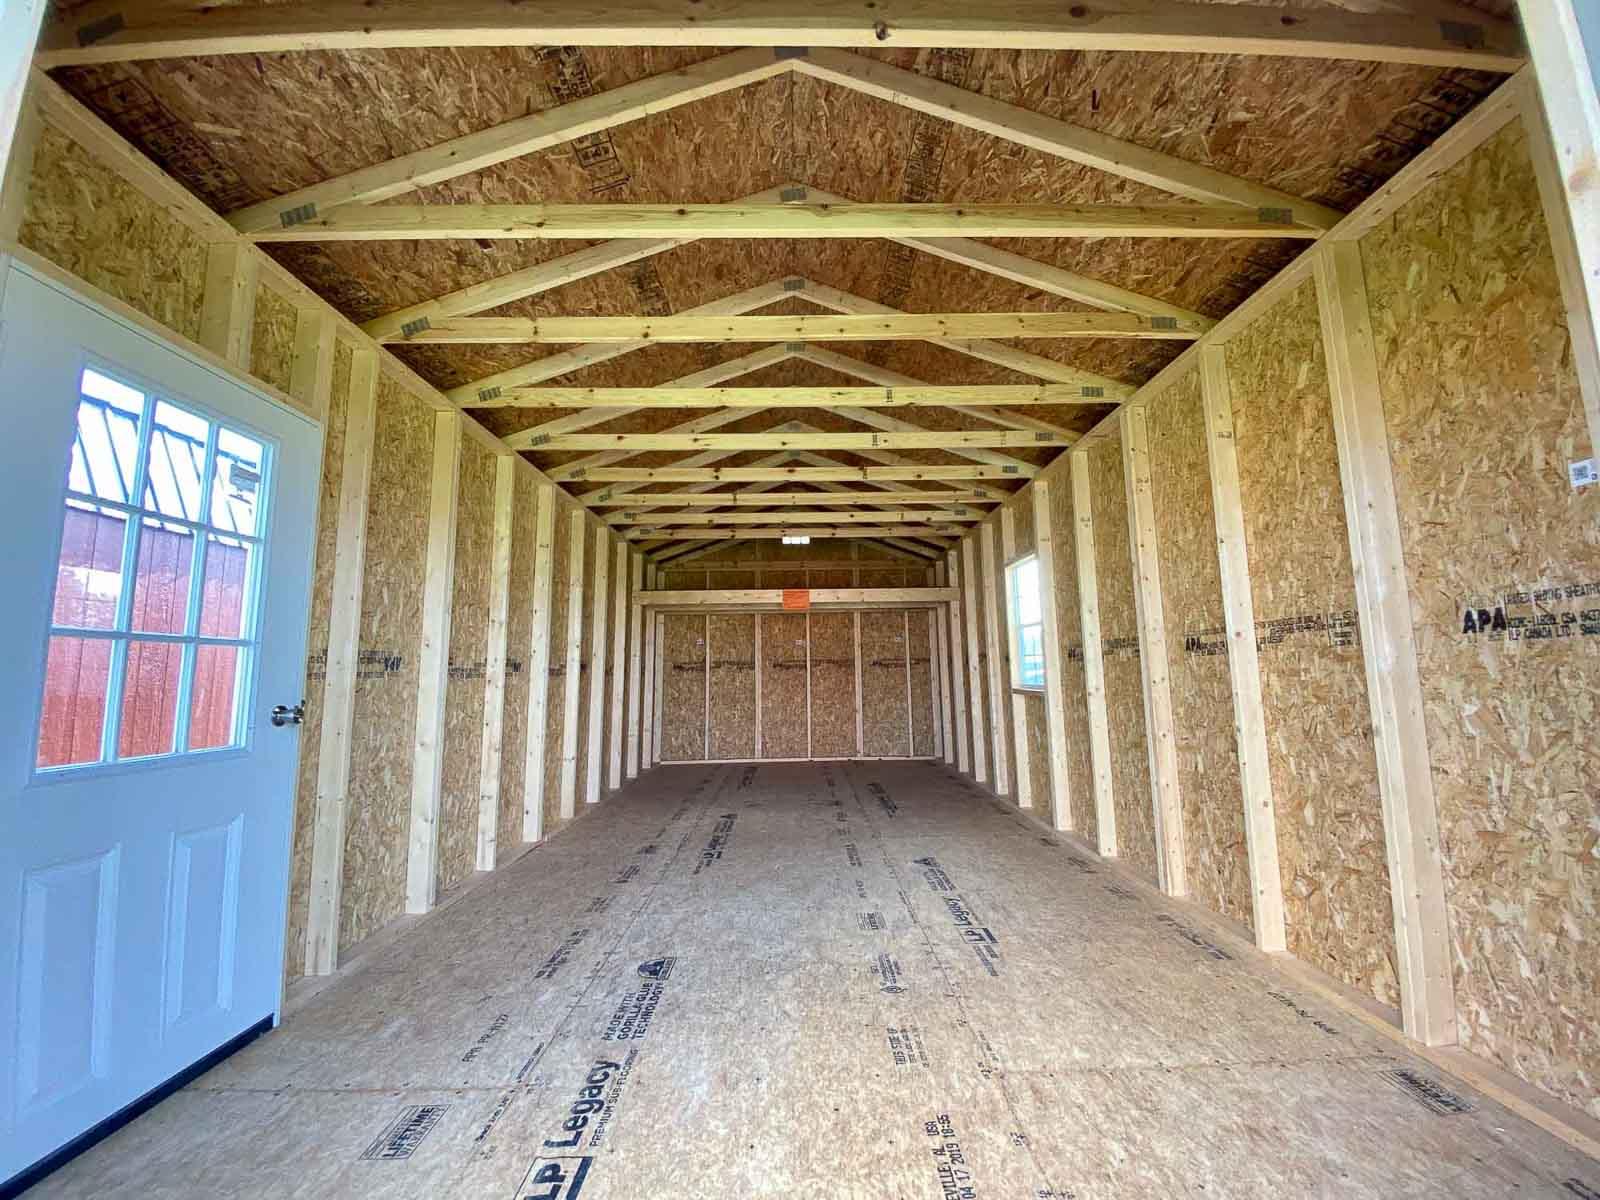 Interior of an Amish Built Garage